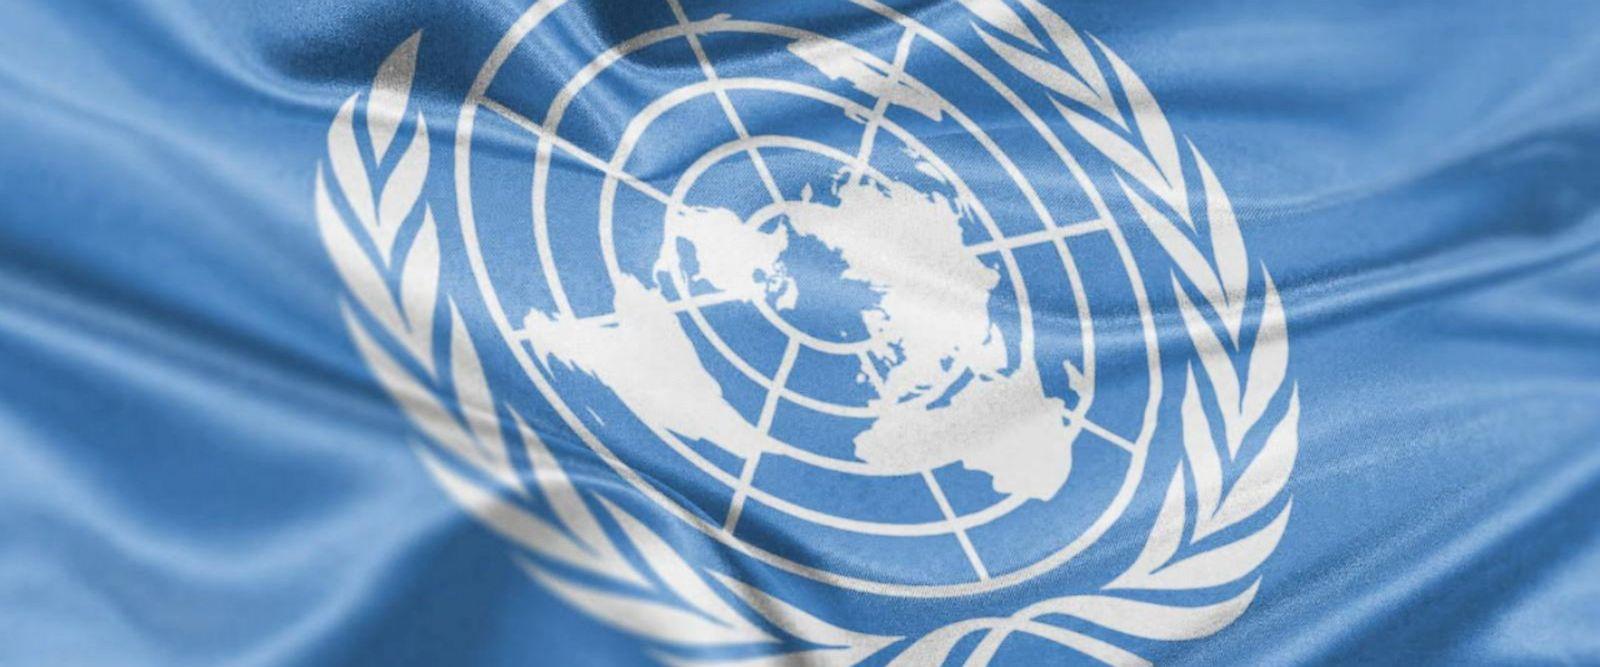 VIDEO: United Nations: The basics